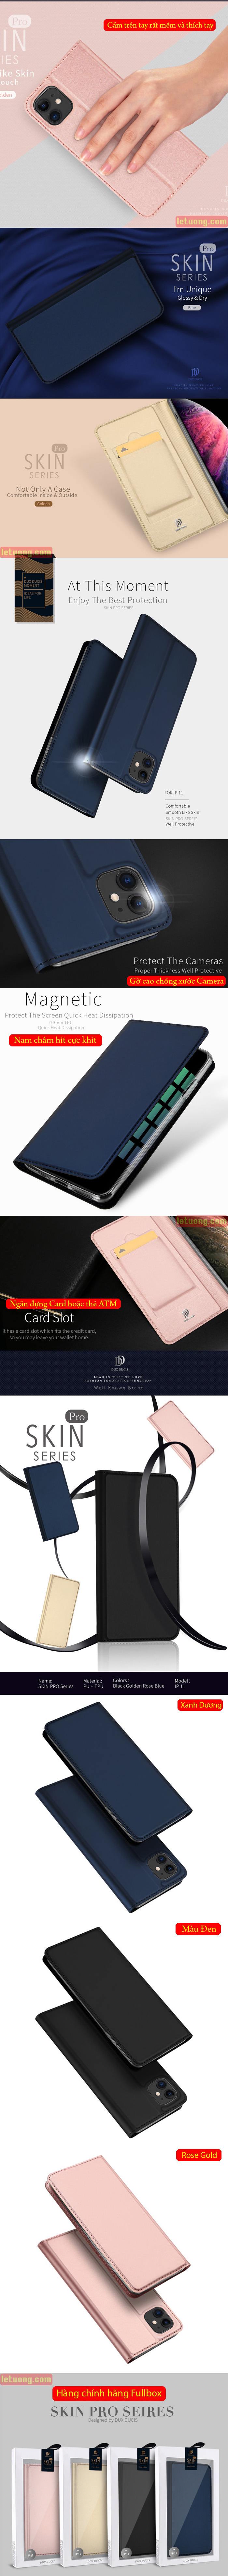 Bao da iPhone 11 Dux Ducis Skin khung mềm siêu mỏng - mềm mịn 5